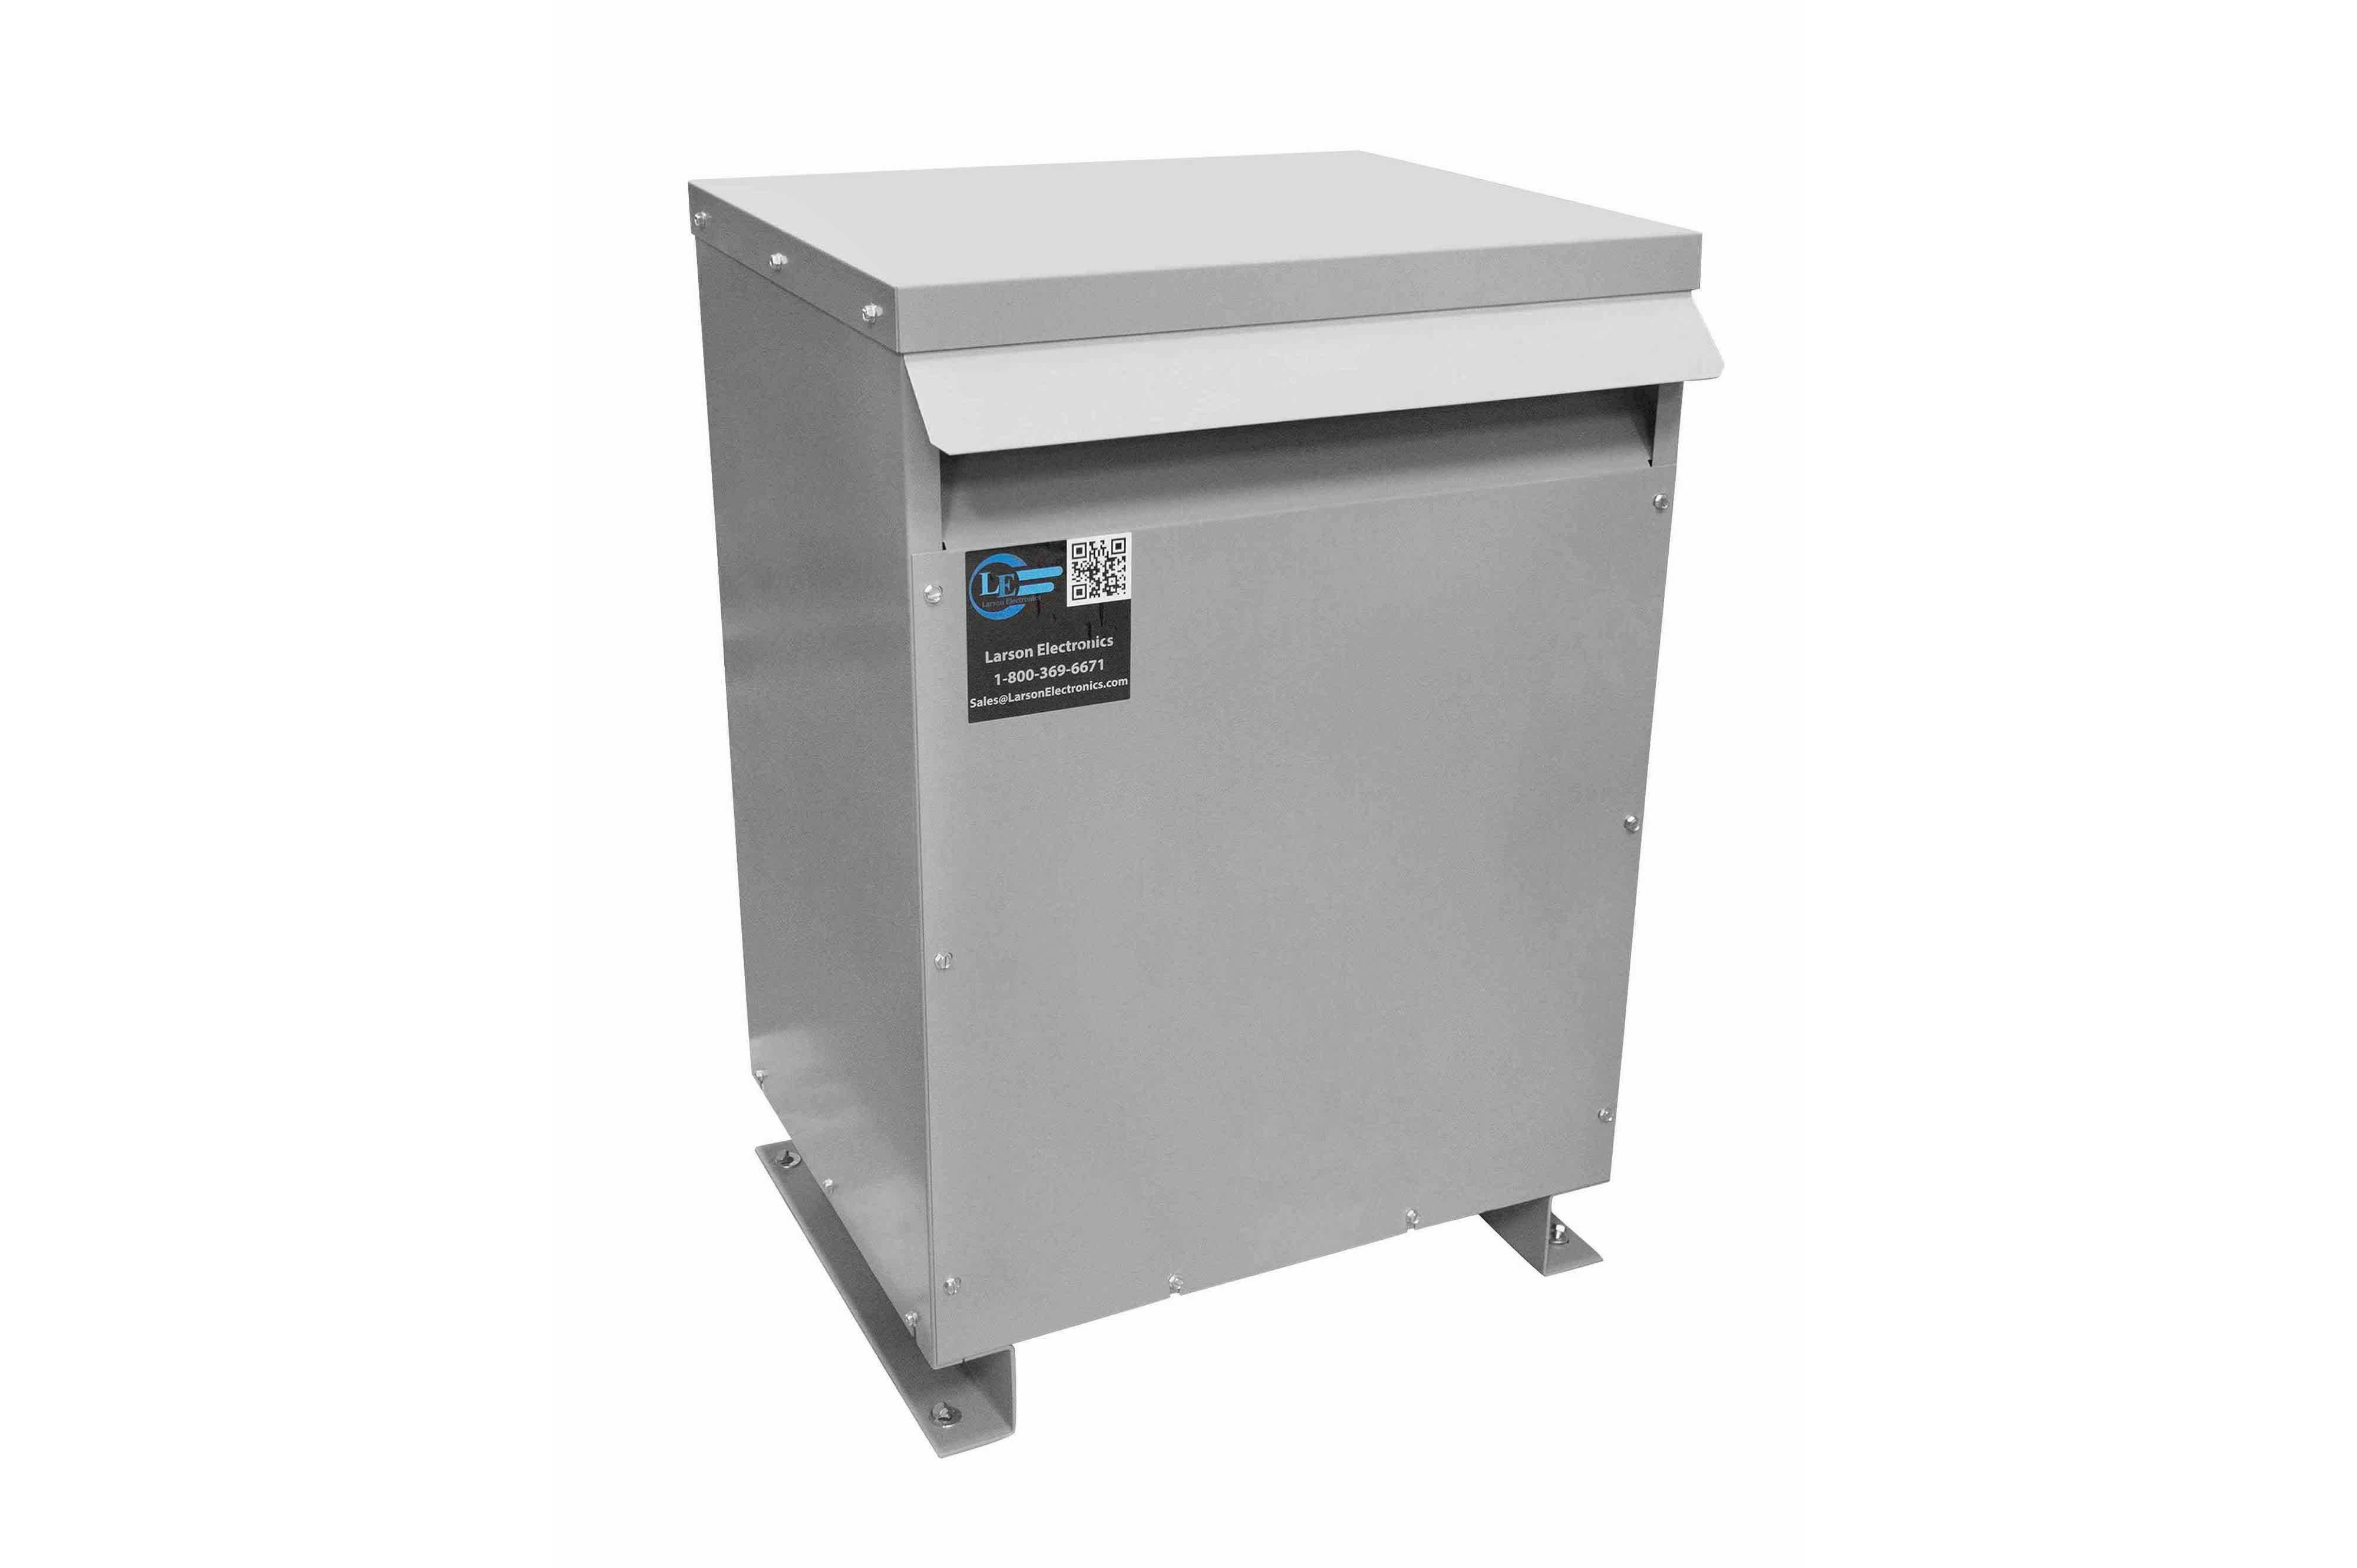 28 kVA 3PH Isolation Transformer, 600V Wye Primary, 240V Delta Secondary, N3R, Ventilated, 60 Hz